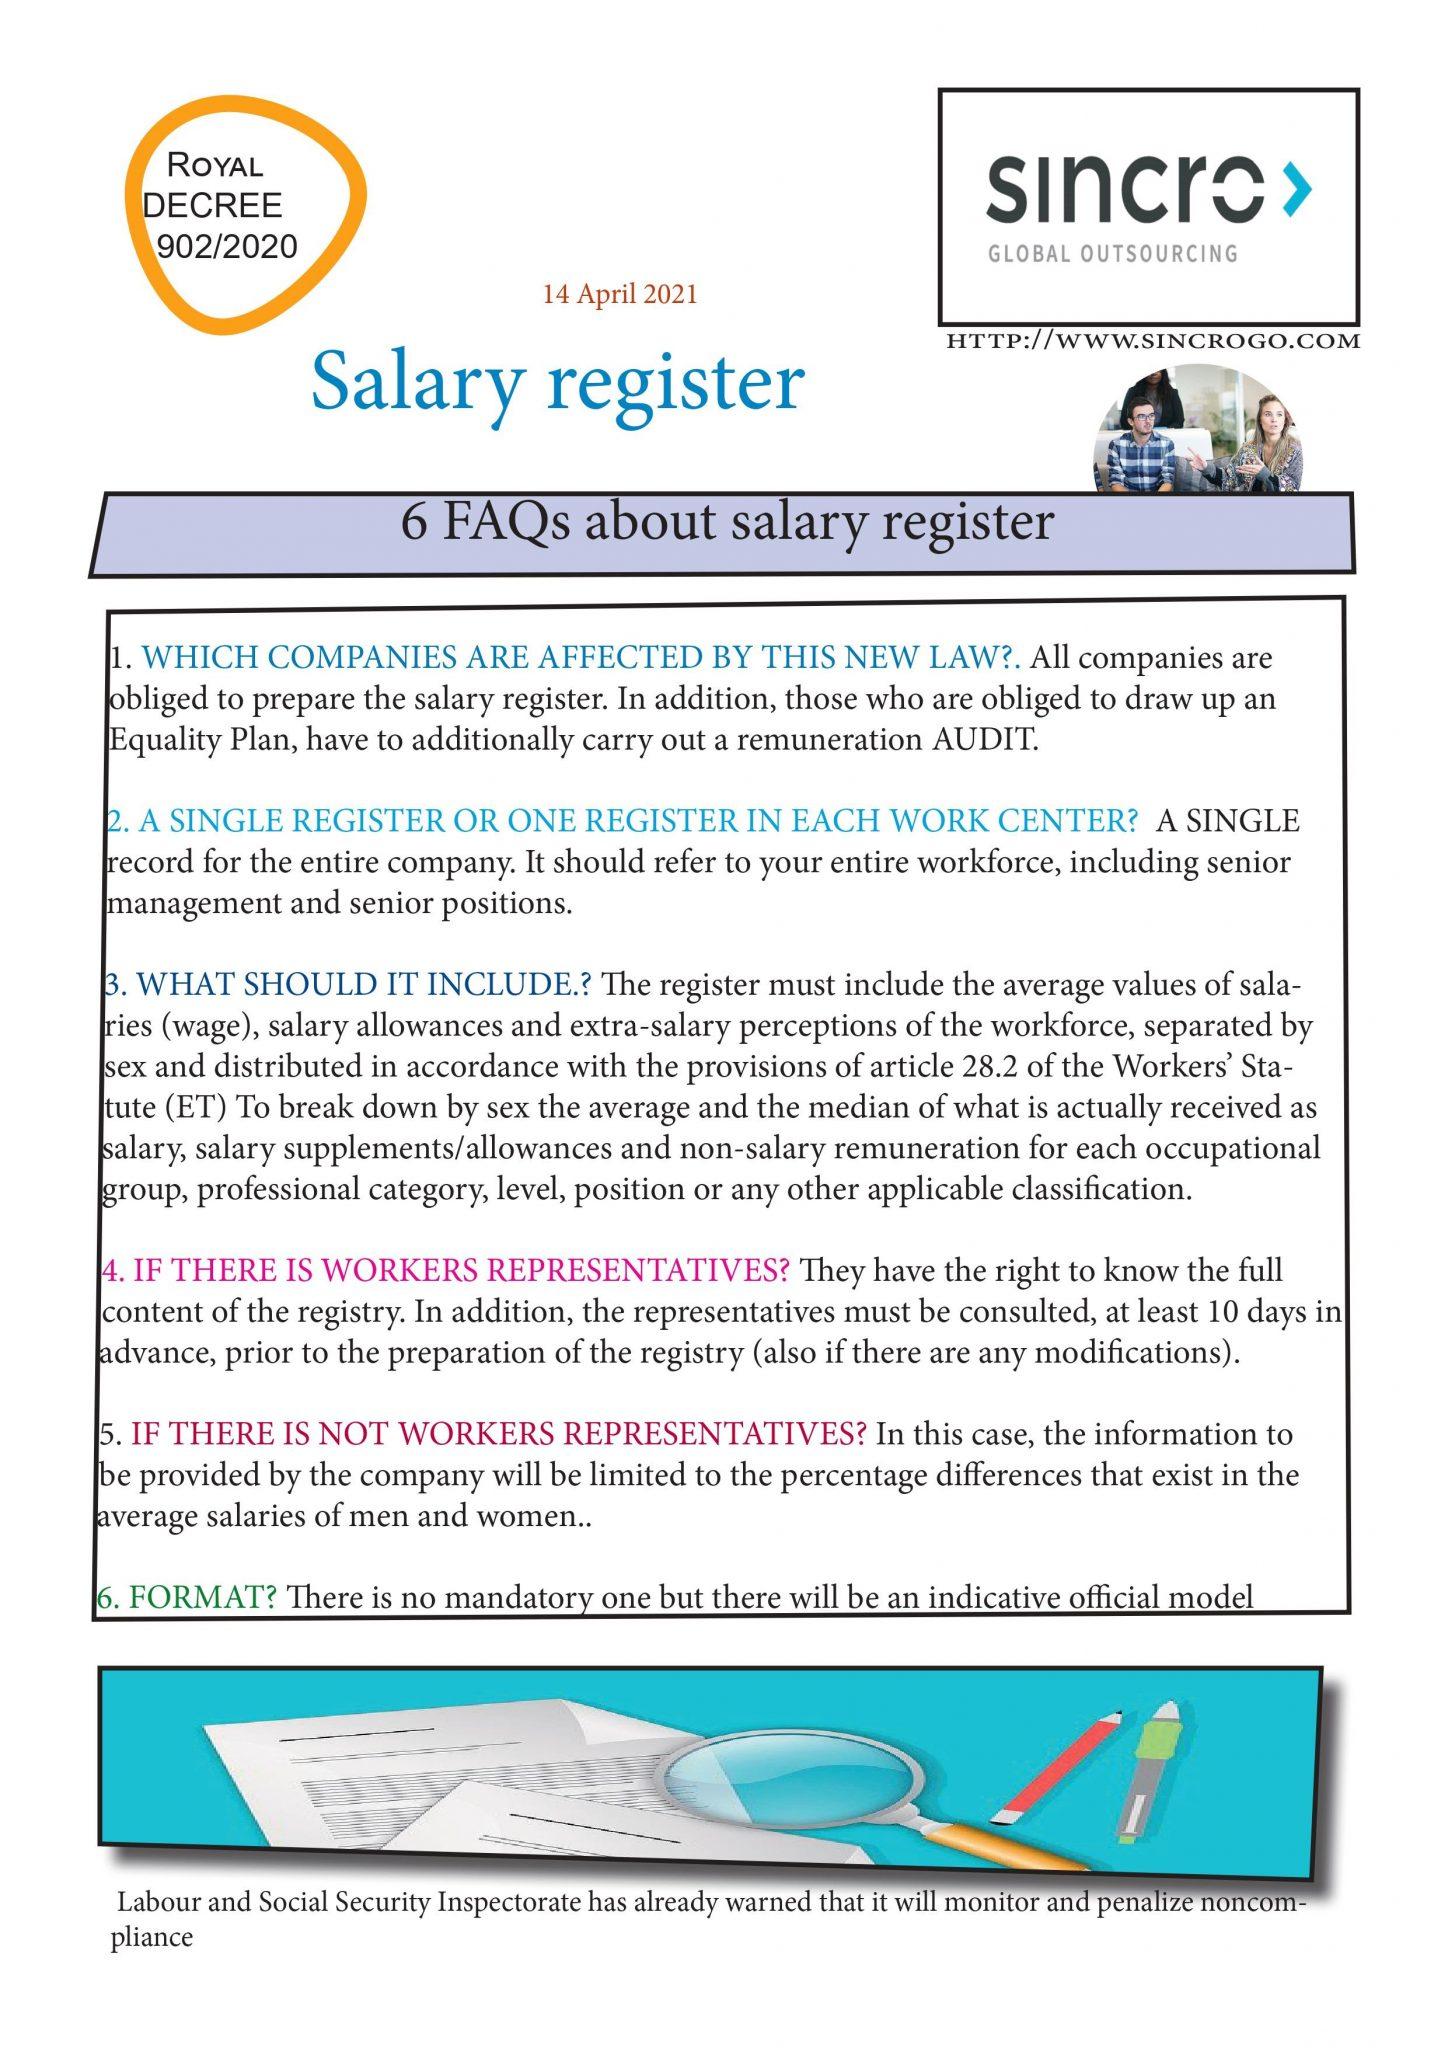 salary register in Spain